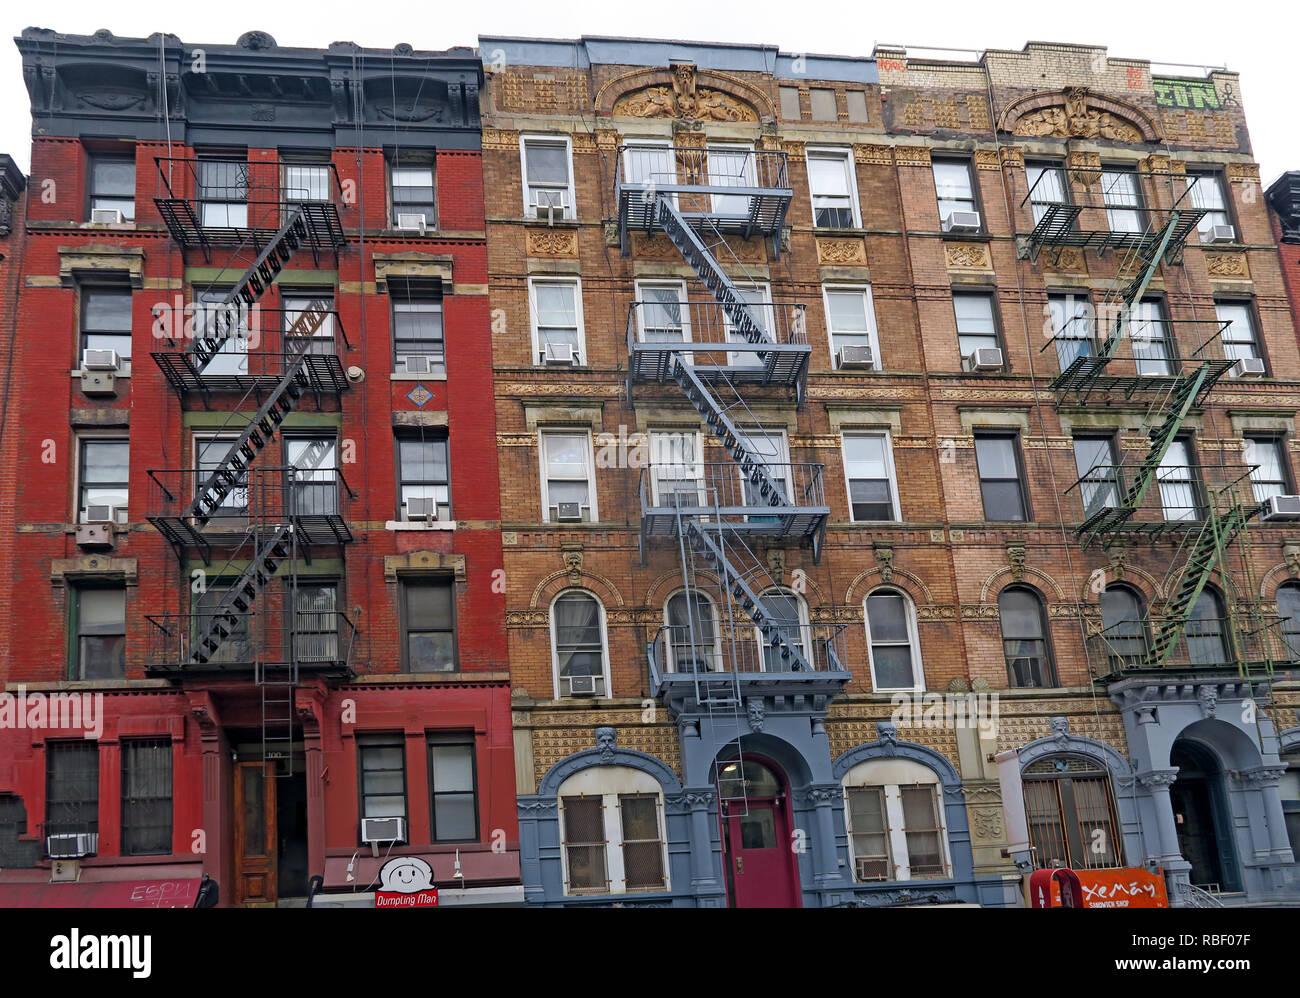 GoTonySmith,@HotpixUK,HotpixUK,NOHO NYC,New York St Marks Place,street,New York Street,USA,America,City Centre,city,centre,center,city center,East Village,Eastvillage,New York Travel Tourism,98,LedZep,98 Saint Marks Place,Manhattan,rock,band,Physical Graffiti,Physical Graffitea,from,Physical Graffiti album,New York City,NY,tenement,history,historic,Album Sleeve,location,Peter Corriston,die-cut,sleeve design,sleeve,design,96 and 98 East 8th Street